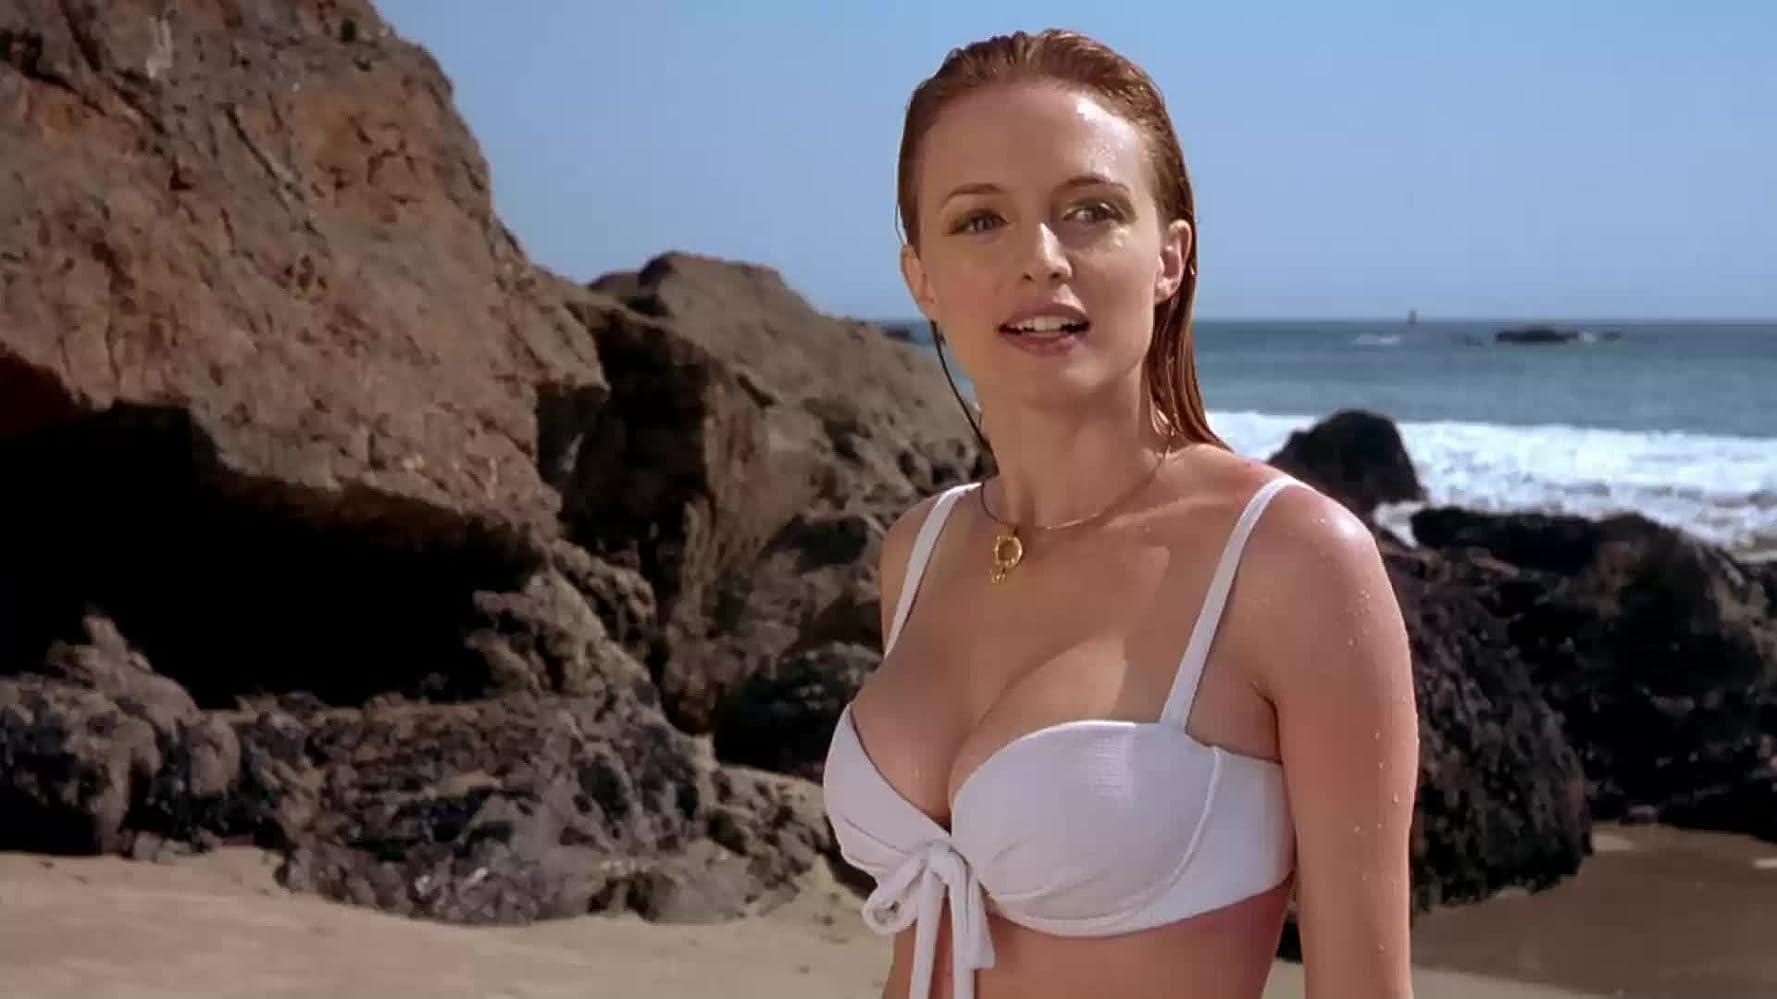 felicity shagwell austin powers white bikini